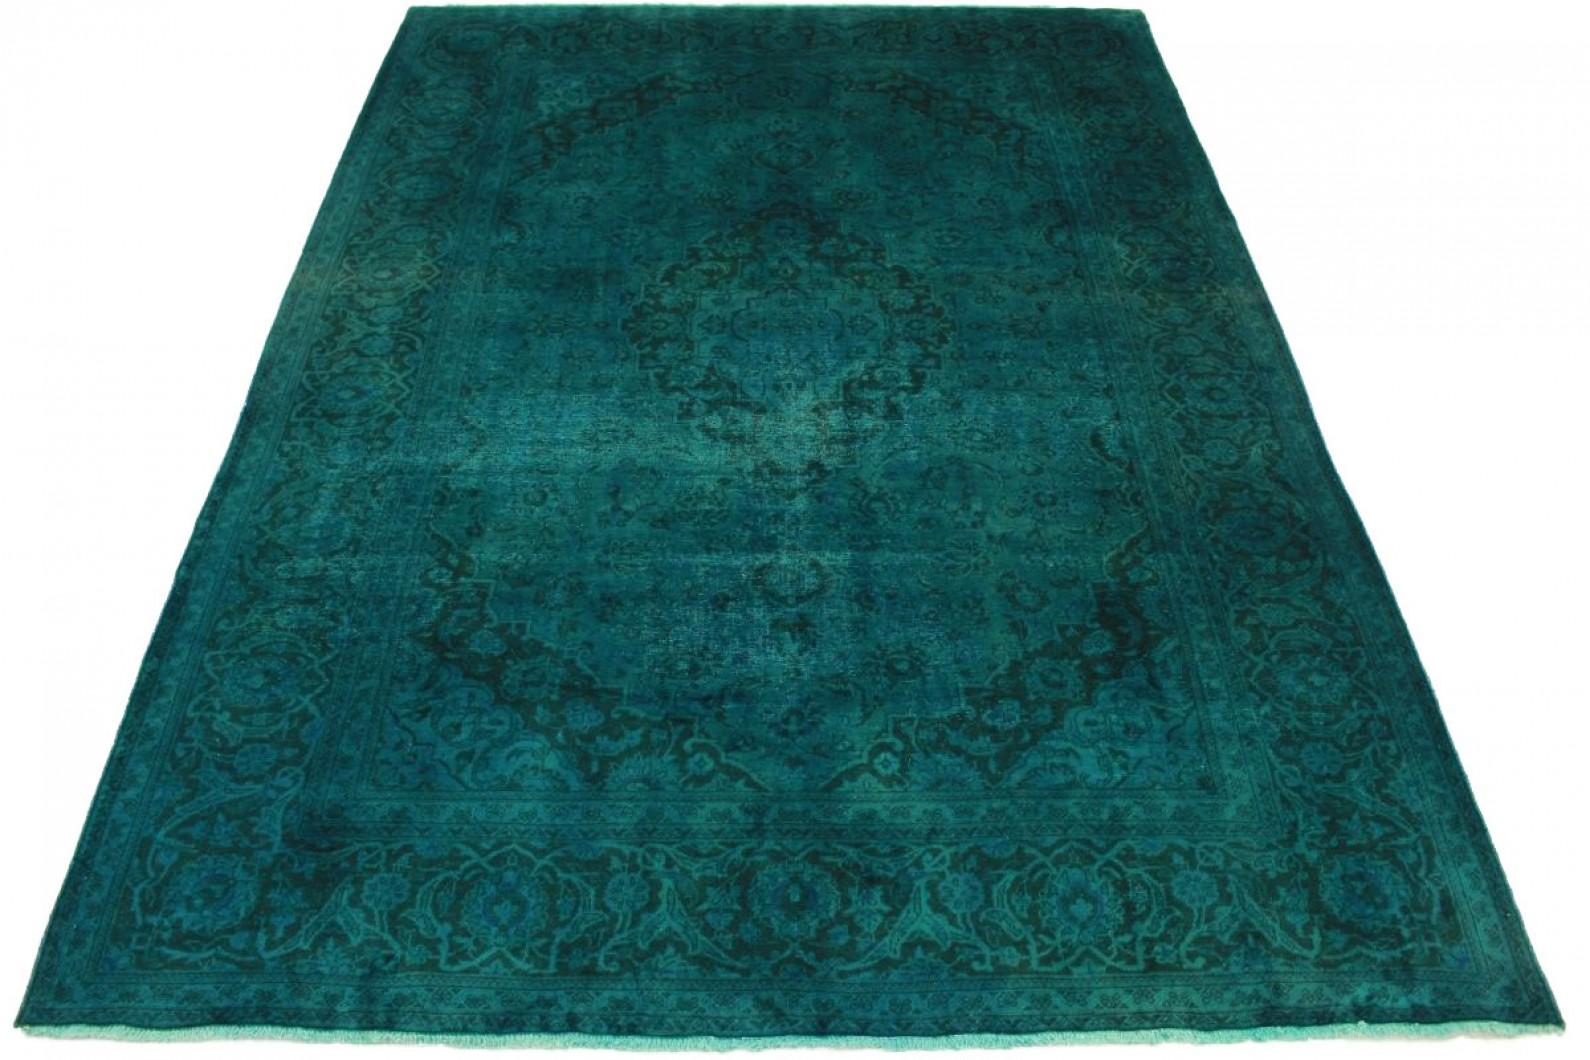 vintage teppich t rkis in 340x250cm 1001 5035 bei kaufen. Black Bedroom Furniture Sets. Home Design Ideas